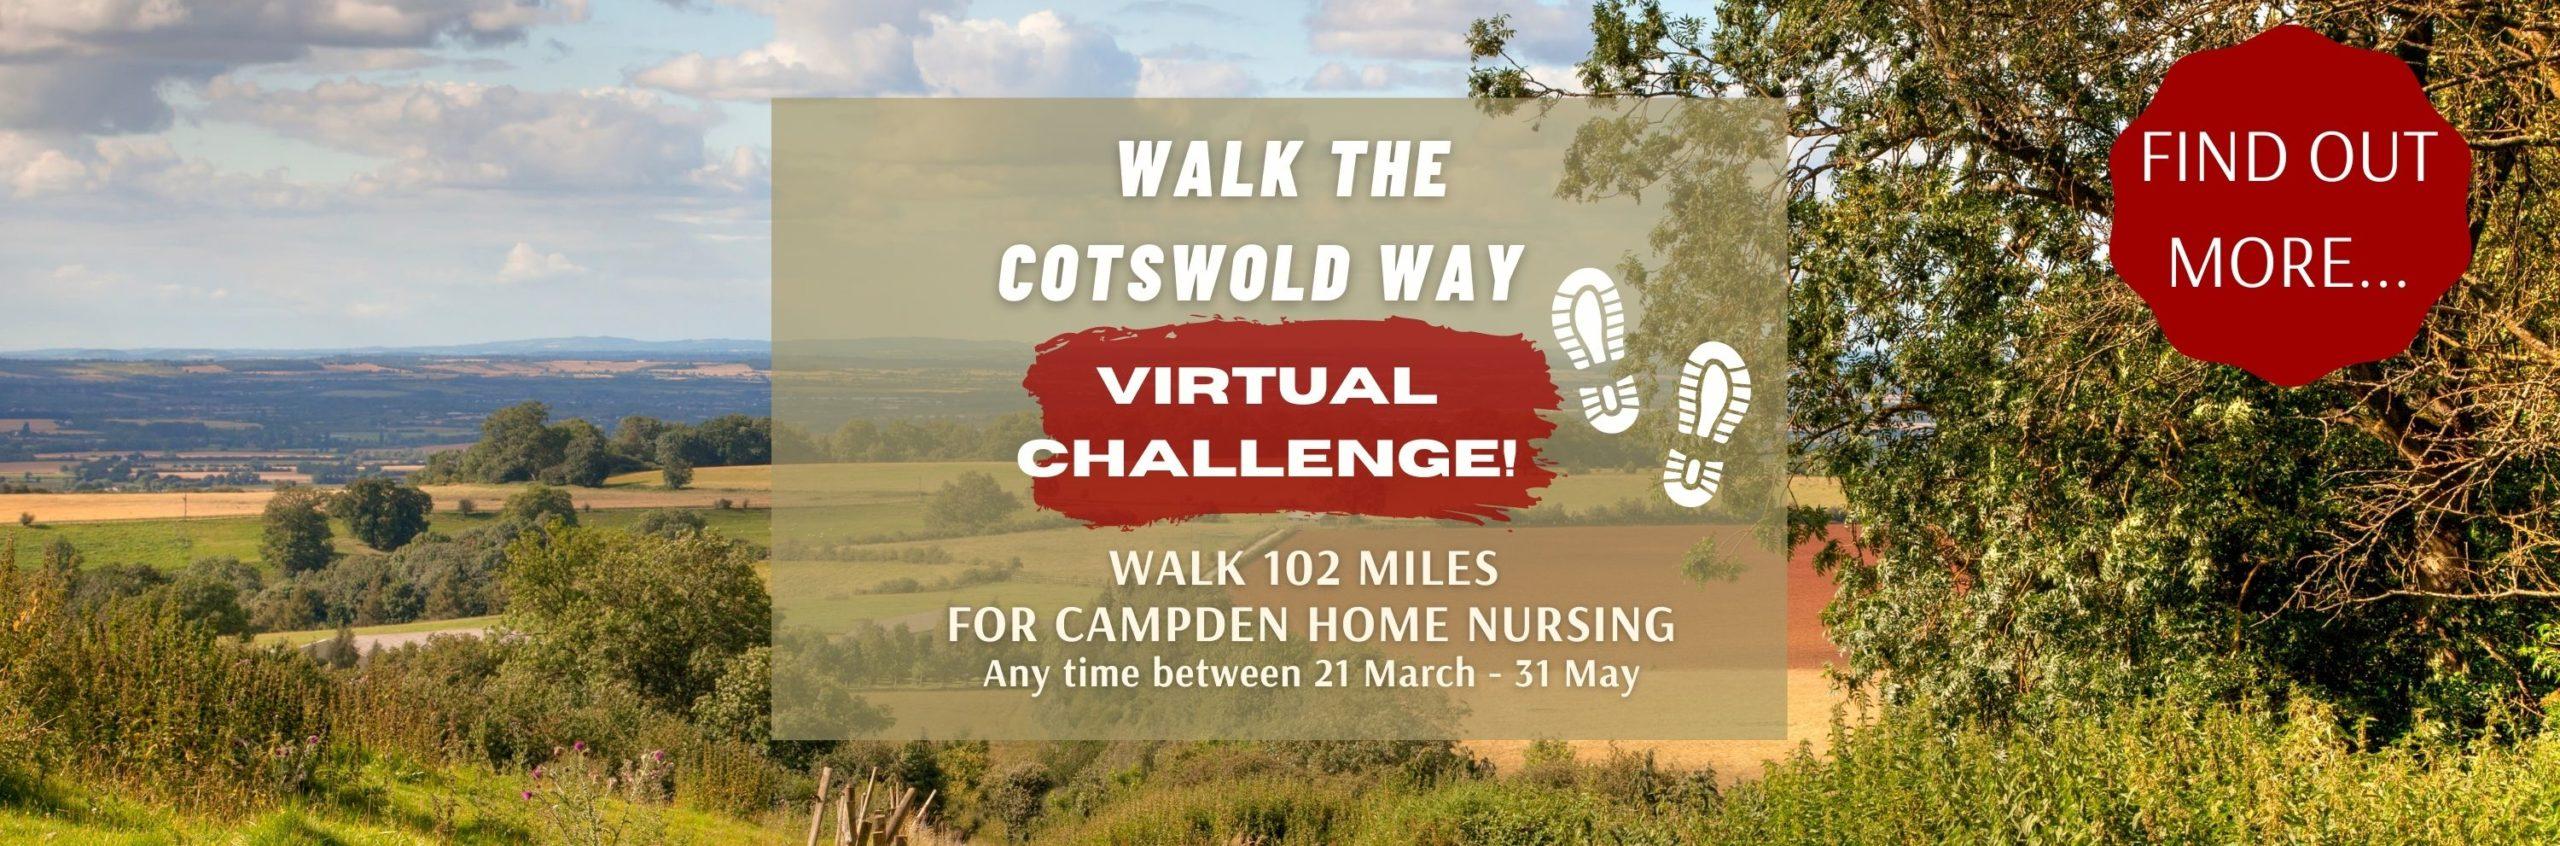 Walk The Cotswold Way (virtually)